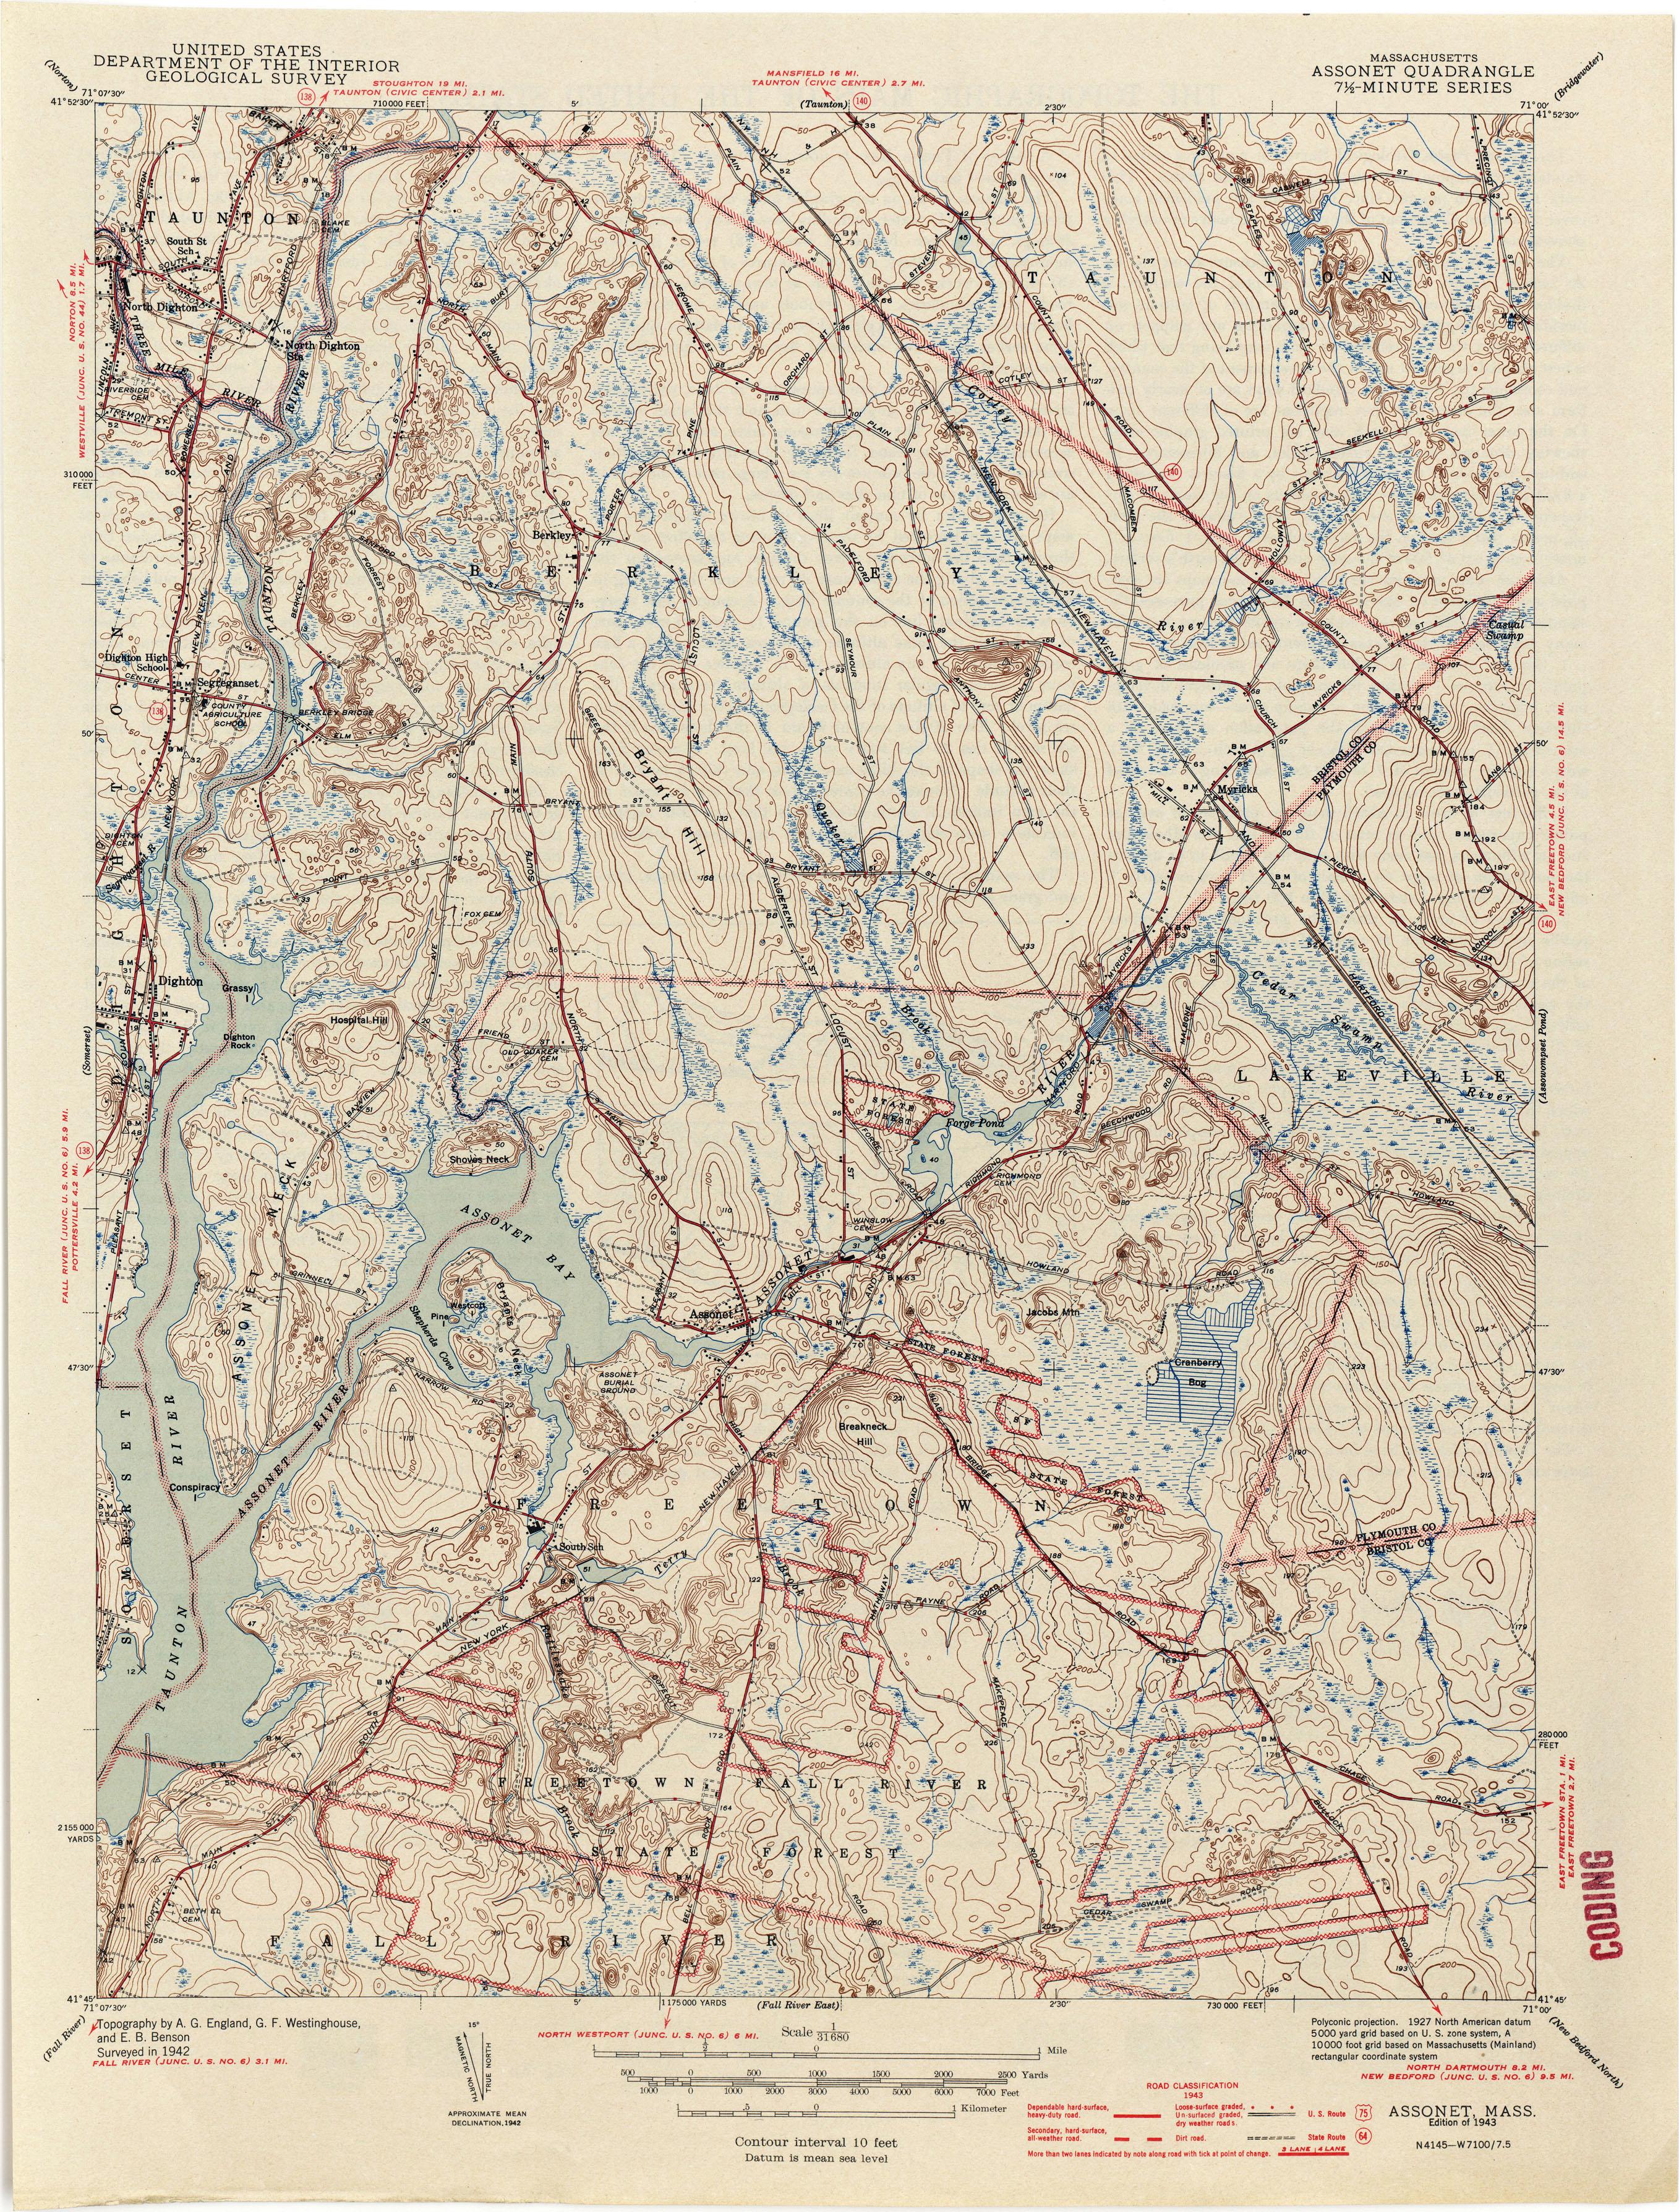 Massachusetts Historical Topographic Maps PerryCastañeda Map - Massachusetts on the us map